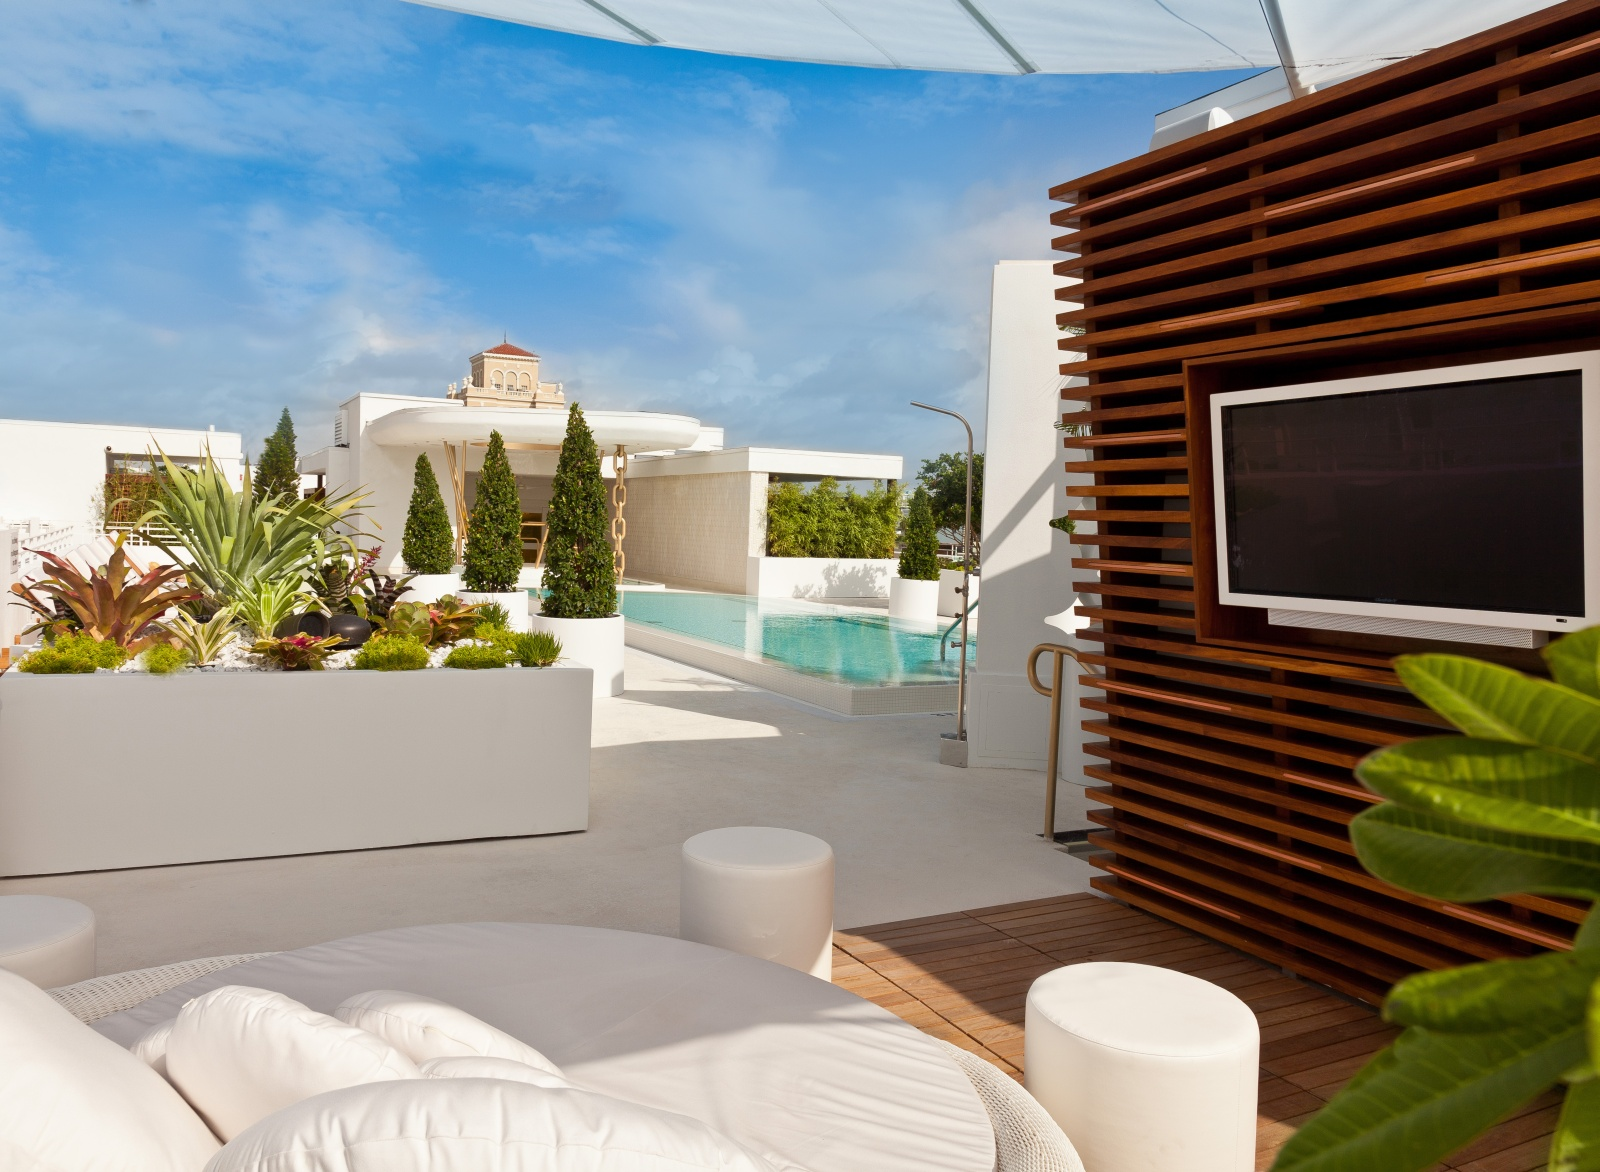 dream south beach. Black Bedroom Furniture Sets. Home Design Ideas